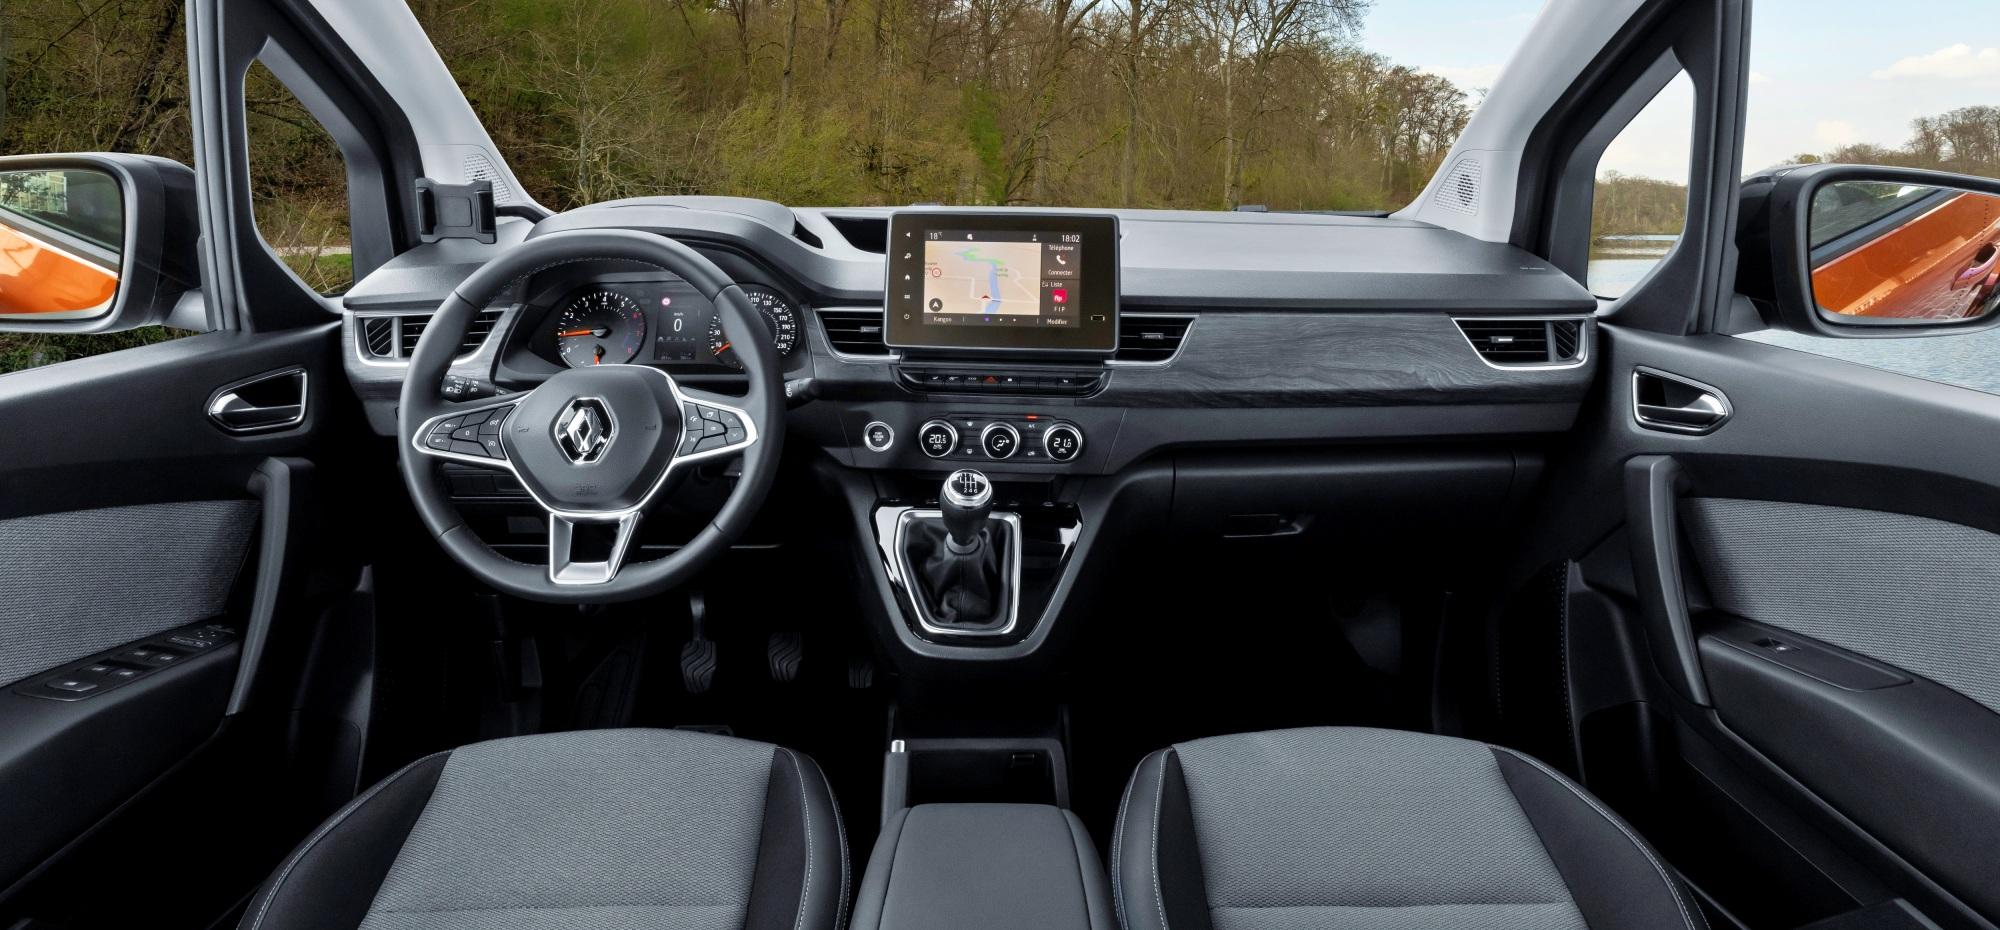 Renault Kangoo deska